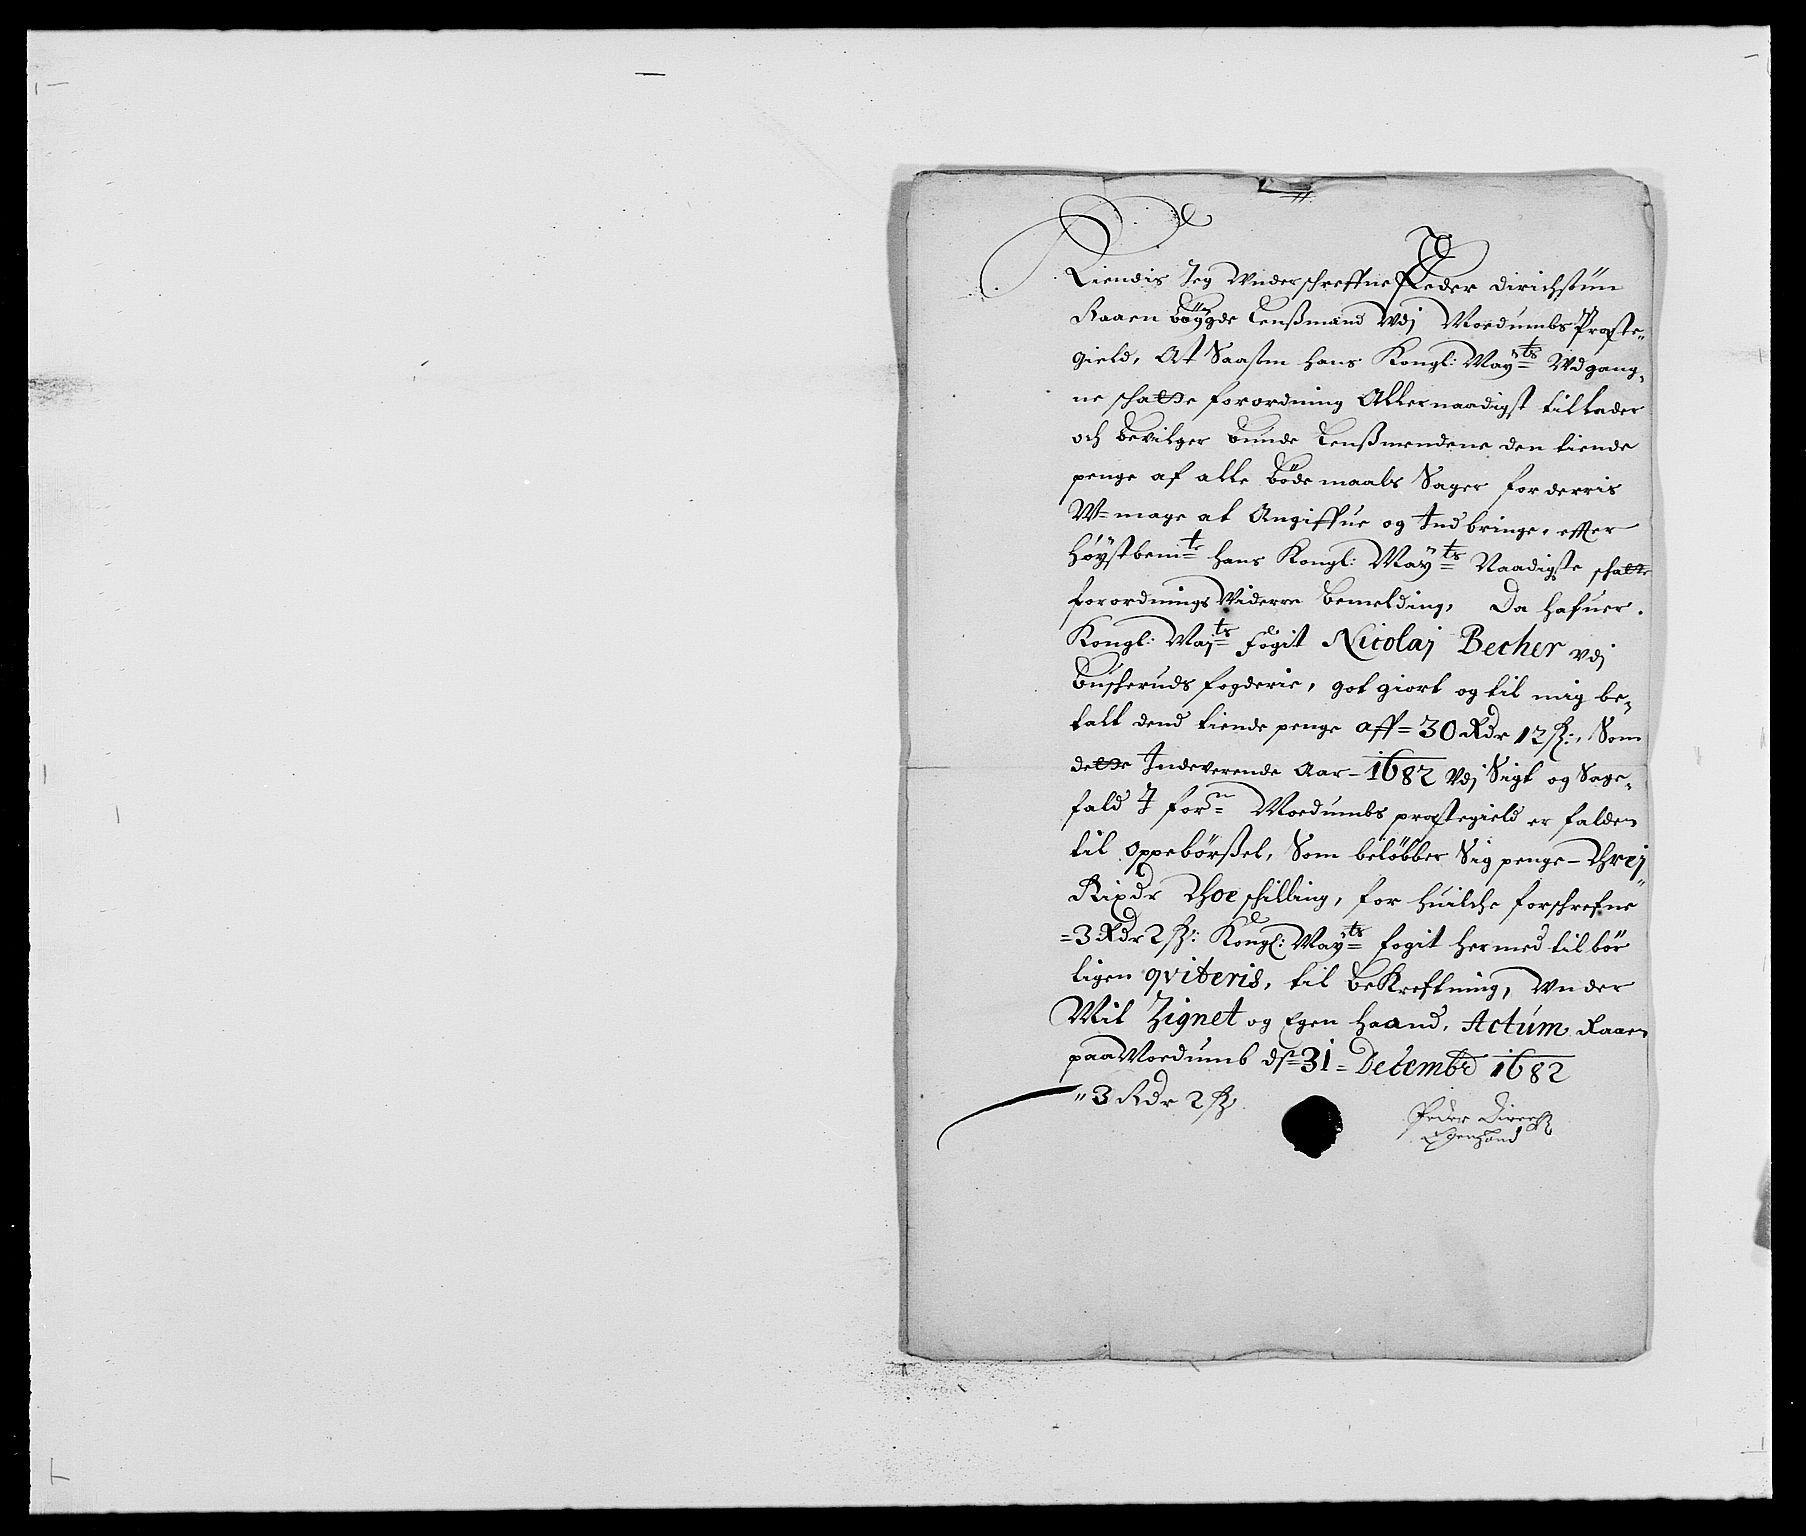 RA, Rentekammeret inntil 1814, Reviderte regnskaper, Fogderegnskap, R25/L1676: Fogderegnskap Buskerud, 1682, s. 218